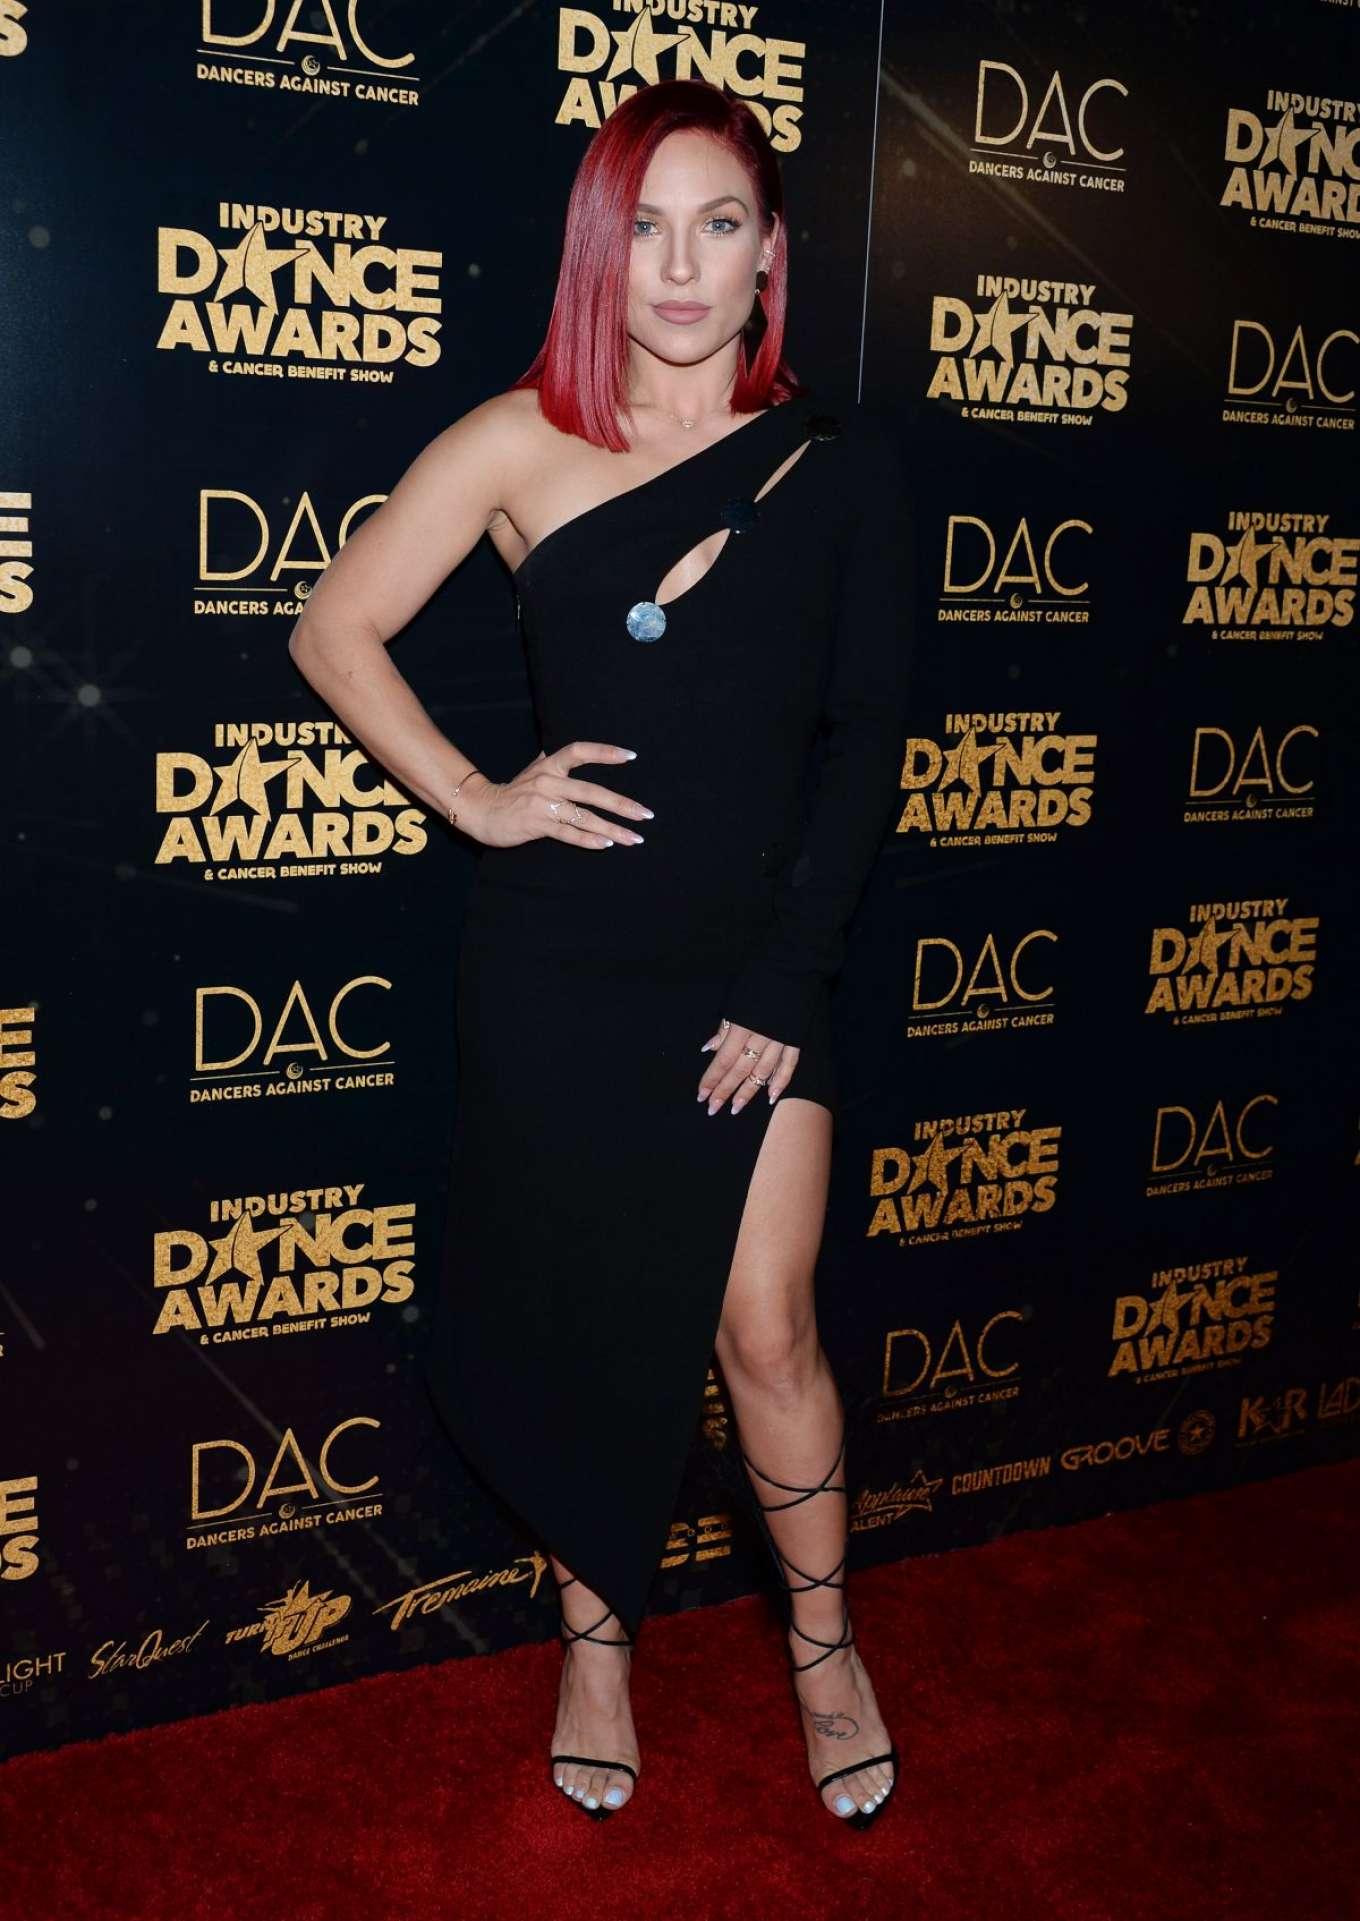 Sharna Burgess 2018 : Sharna Burgess: 2018 Industry Dance Awards -04